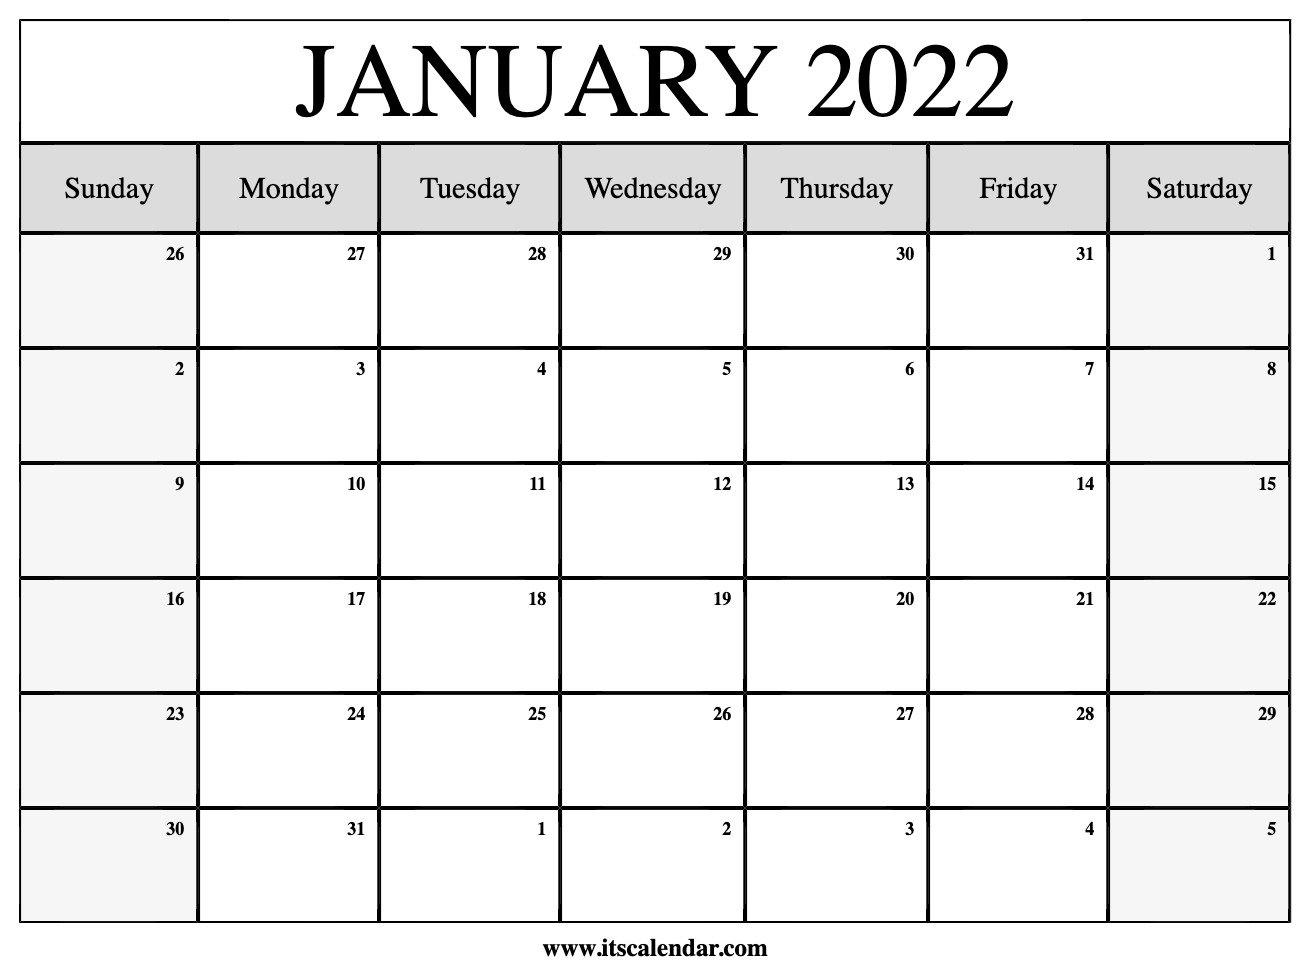 Free Printable January 2022 Calendar inside March April May 2022 Calendar Printable